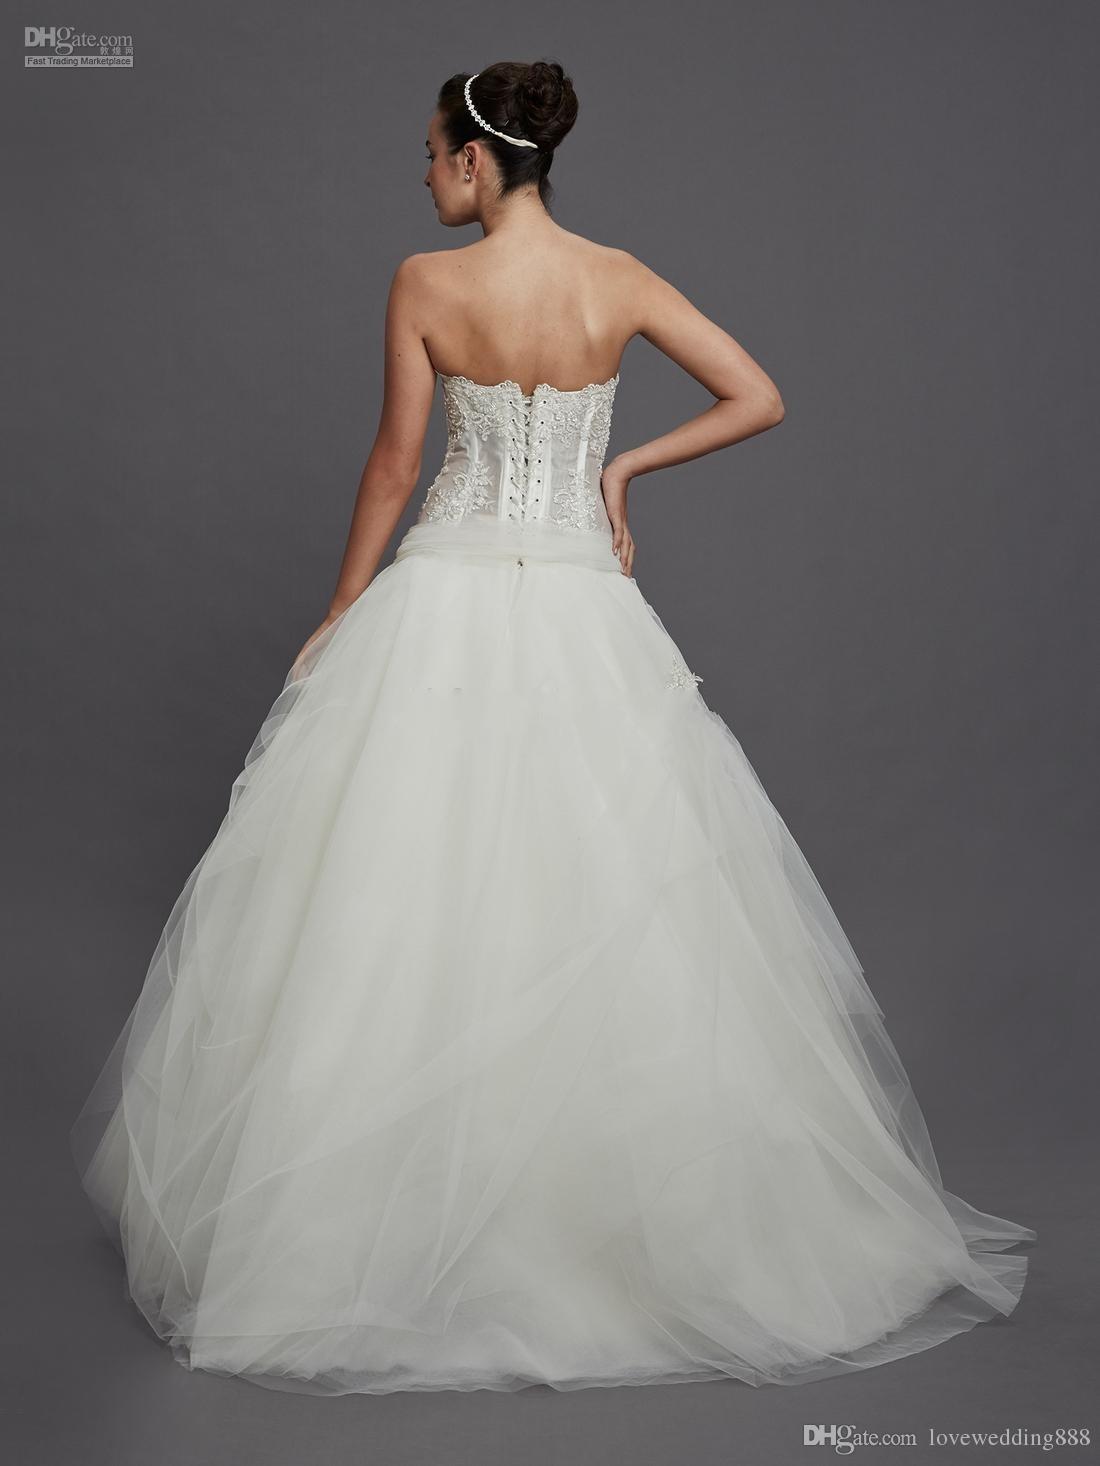 Custom made ball gown Corset and Tulle wedding dress Pnina Tornai ...